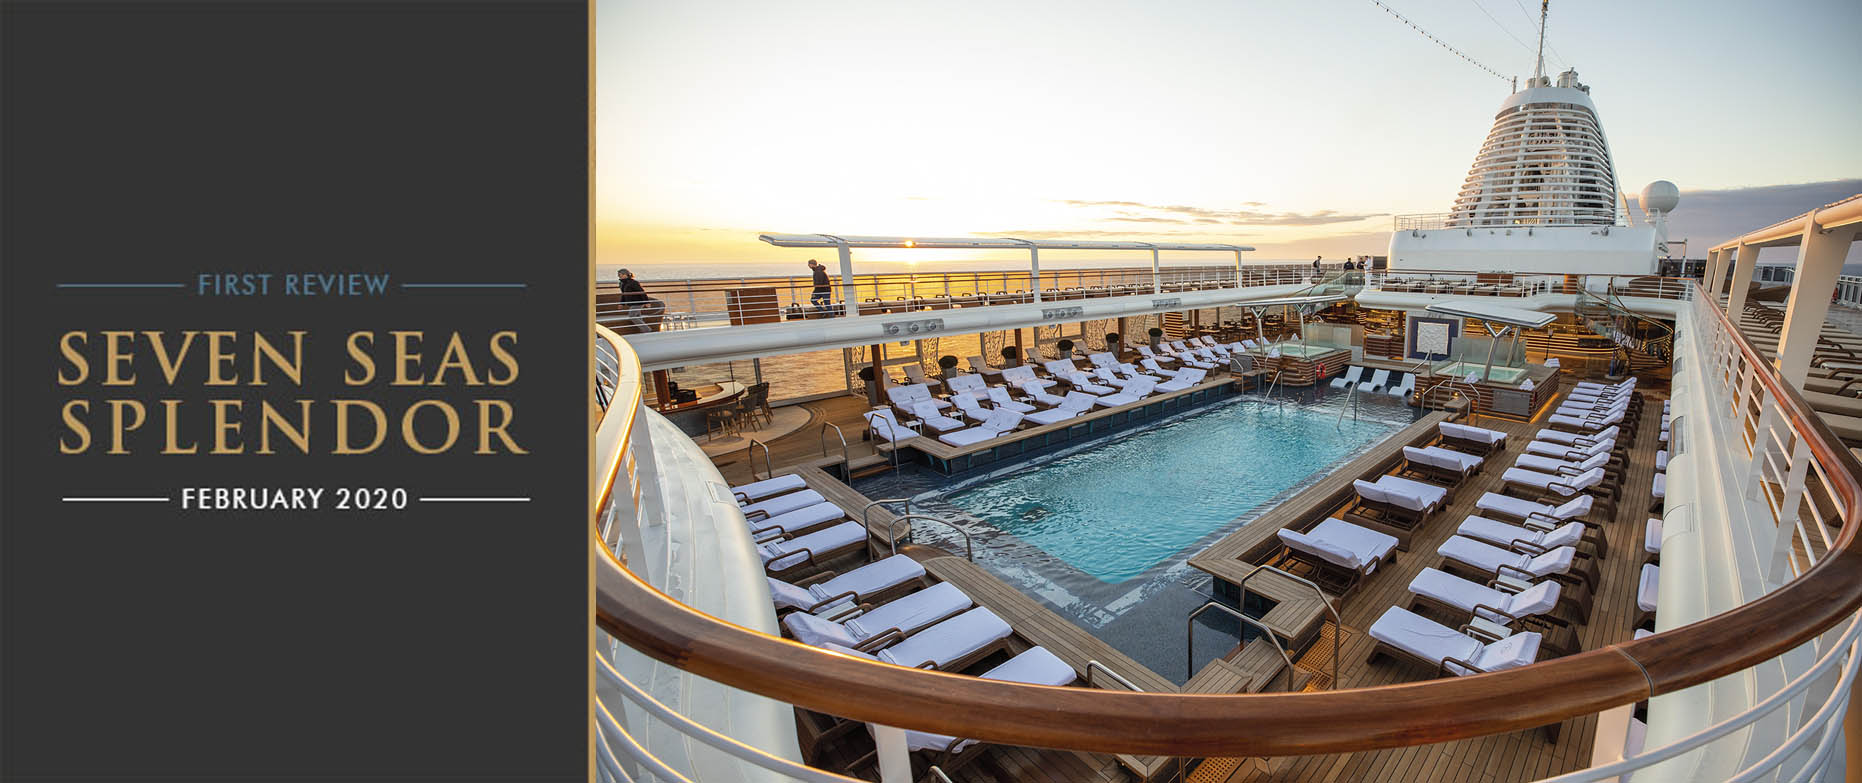 Luxury Perfected? Seven Seas Splendor Review